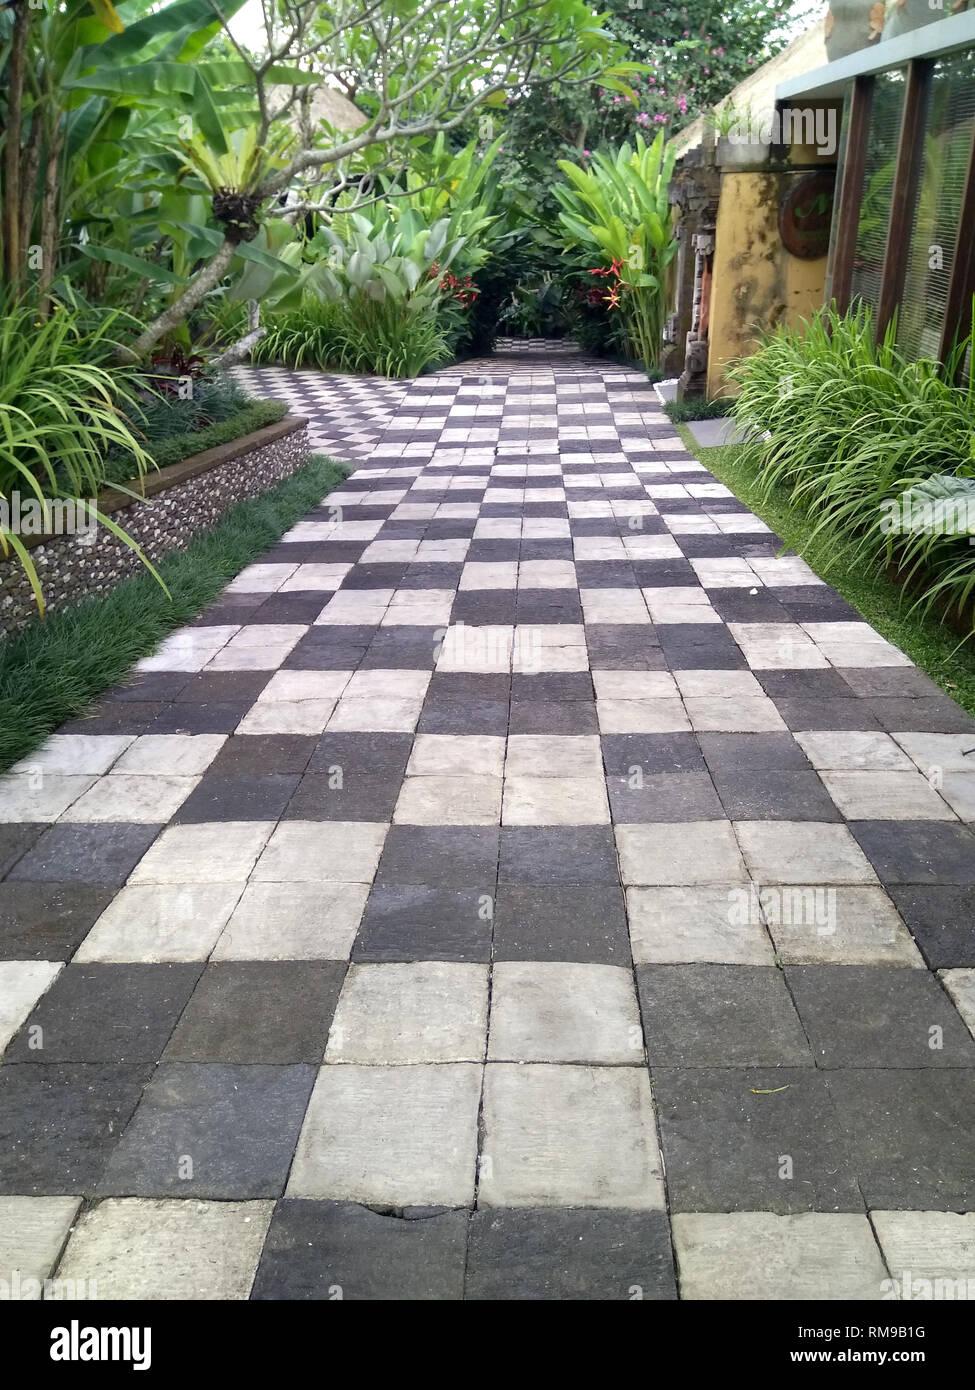 Ubud-Green entranced chess styled paved path - Stock Image